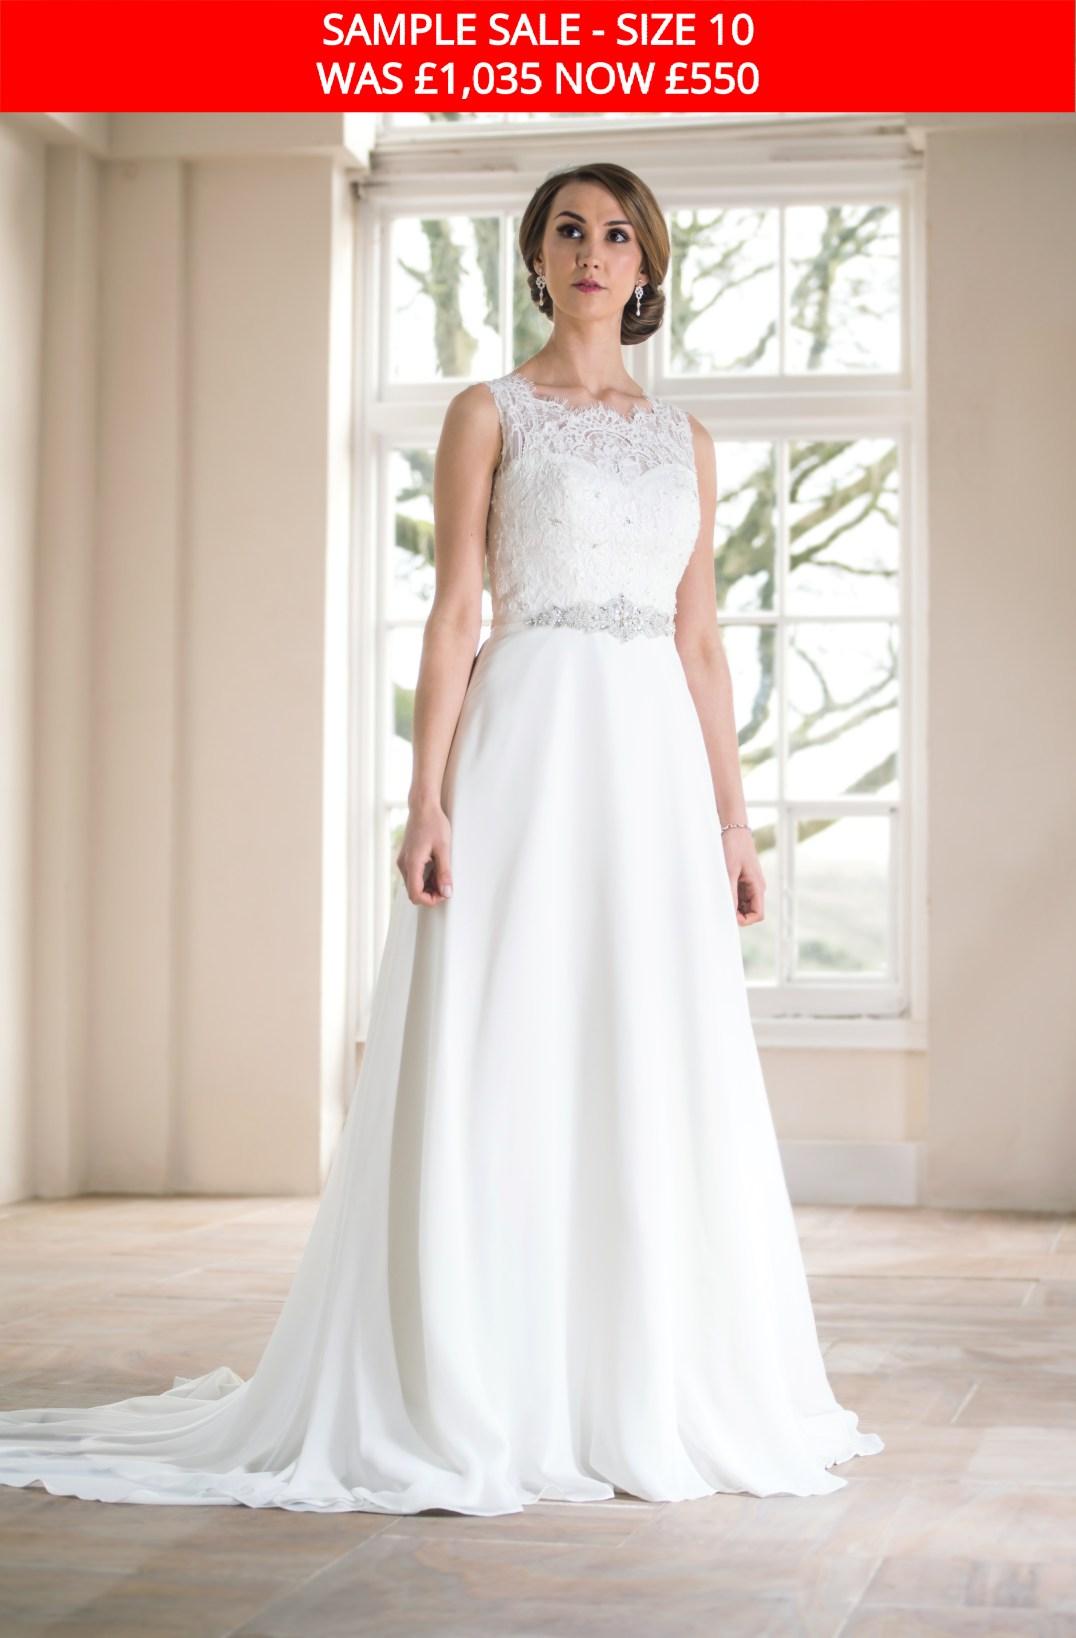 GAIA 1508 wedding gown sample sale